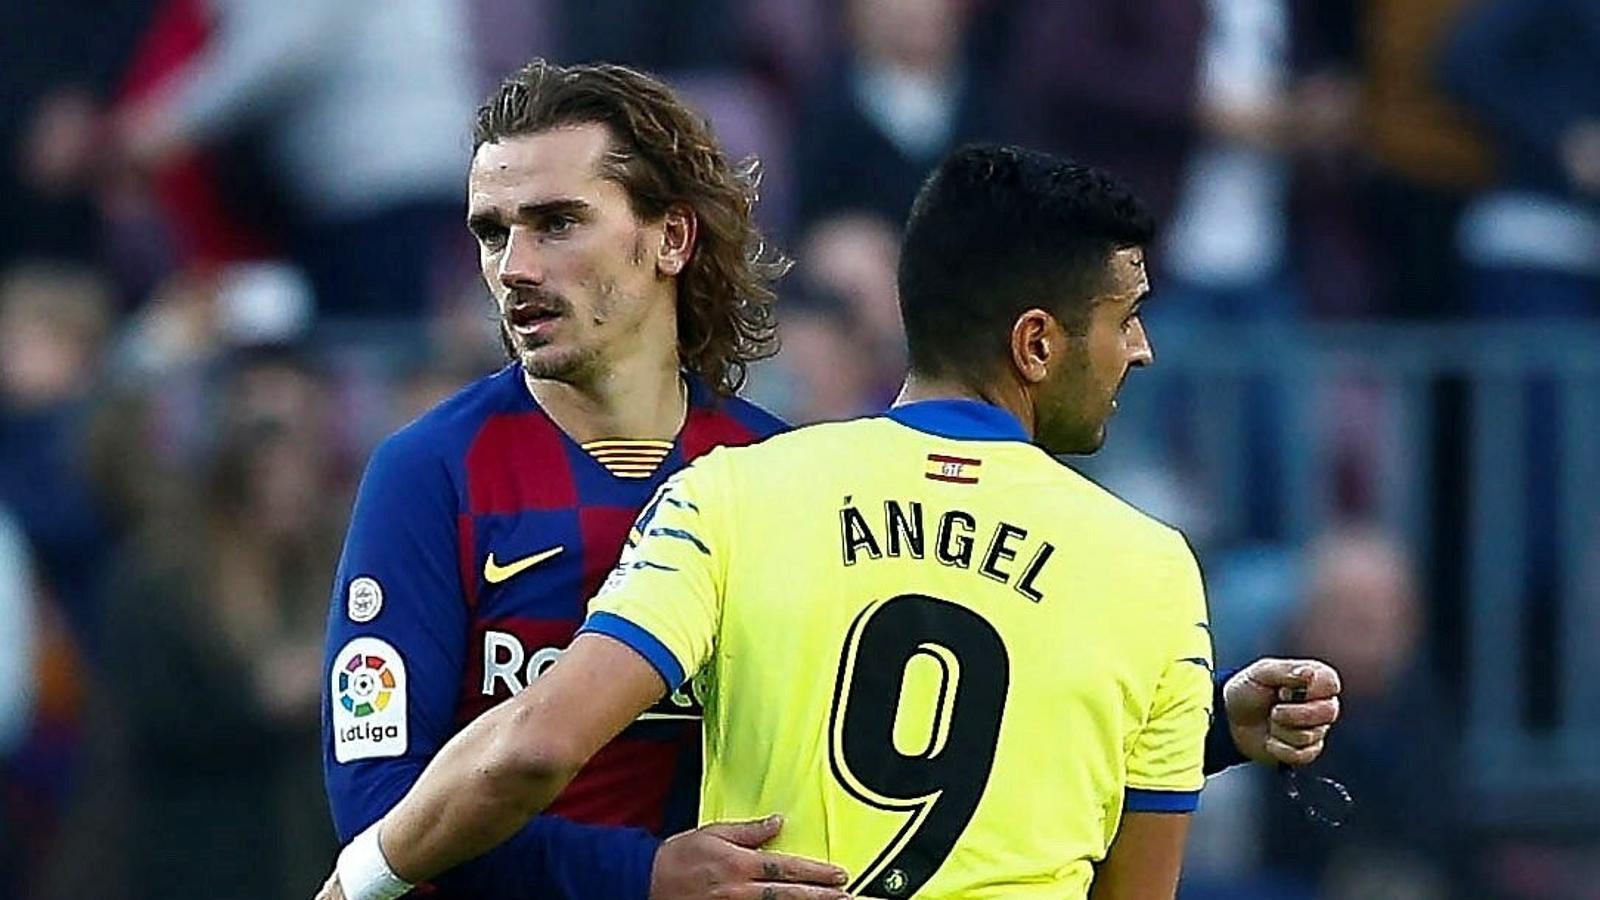 Griezmann torna a veure porteria mentre Ángel es presenta al Camp Nou